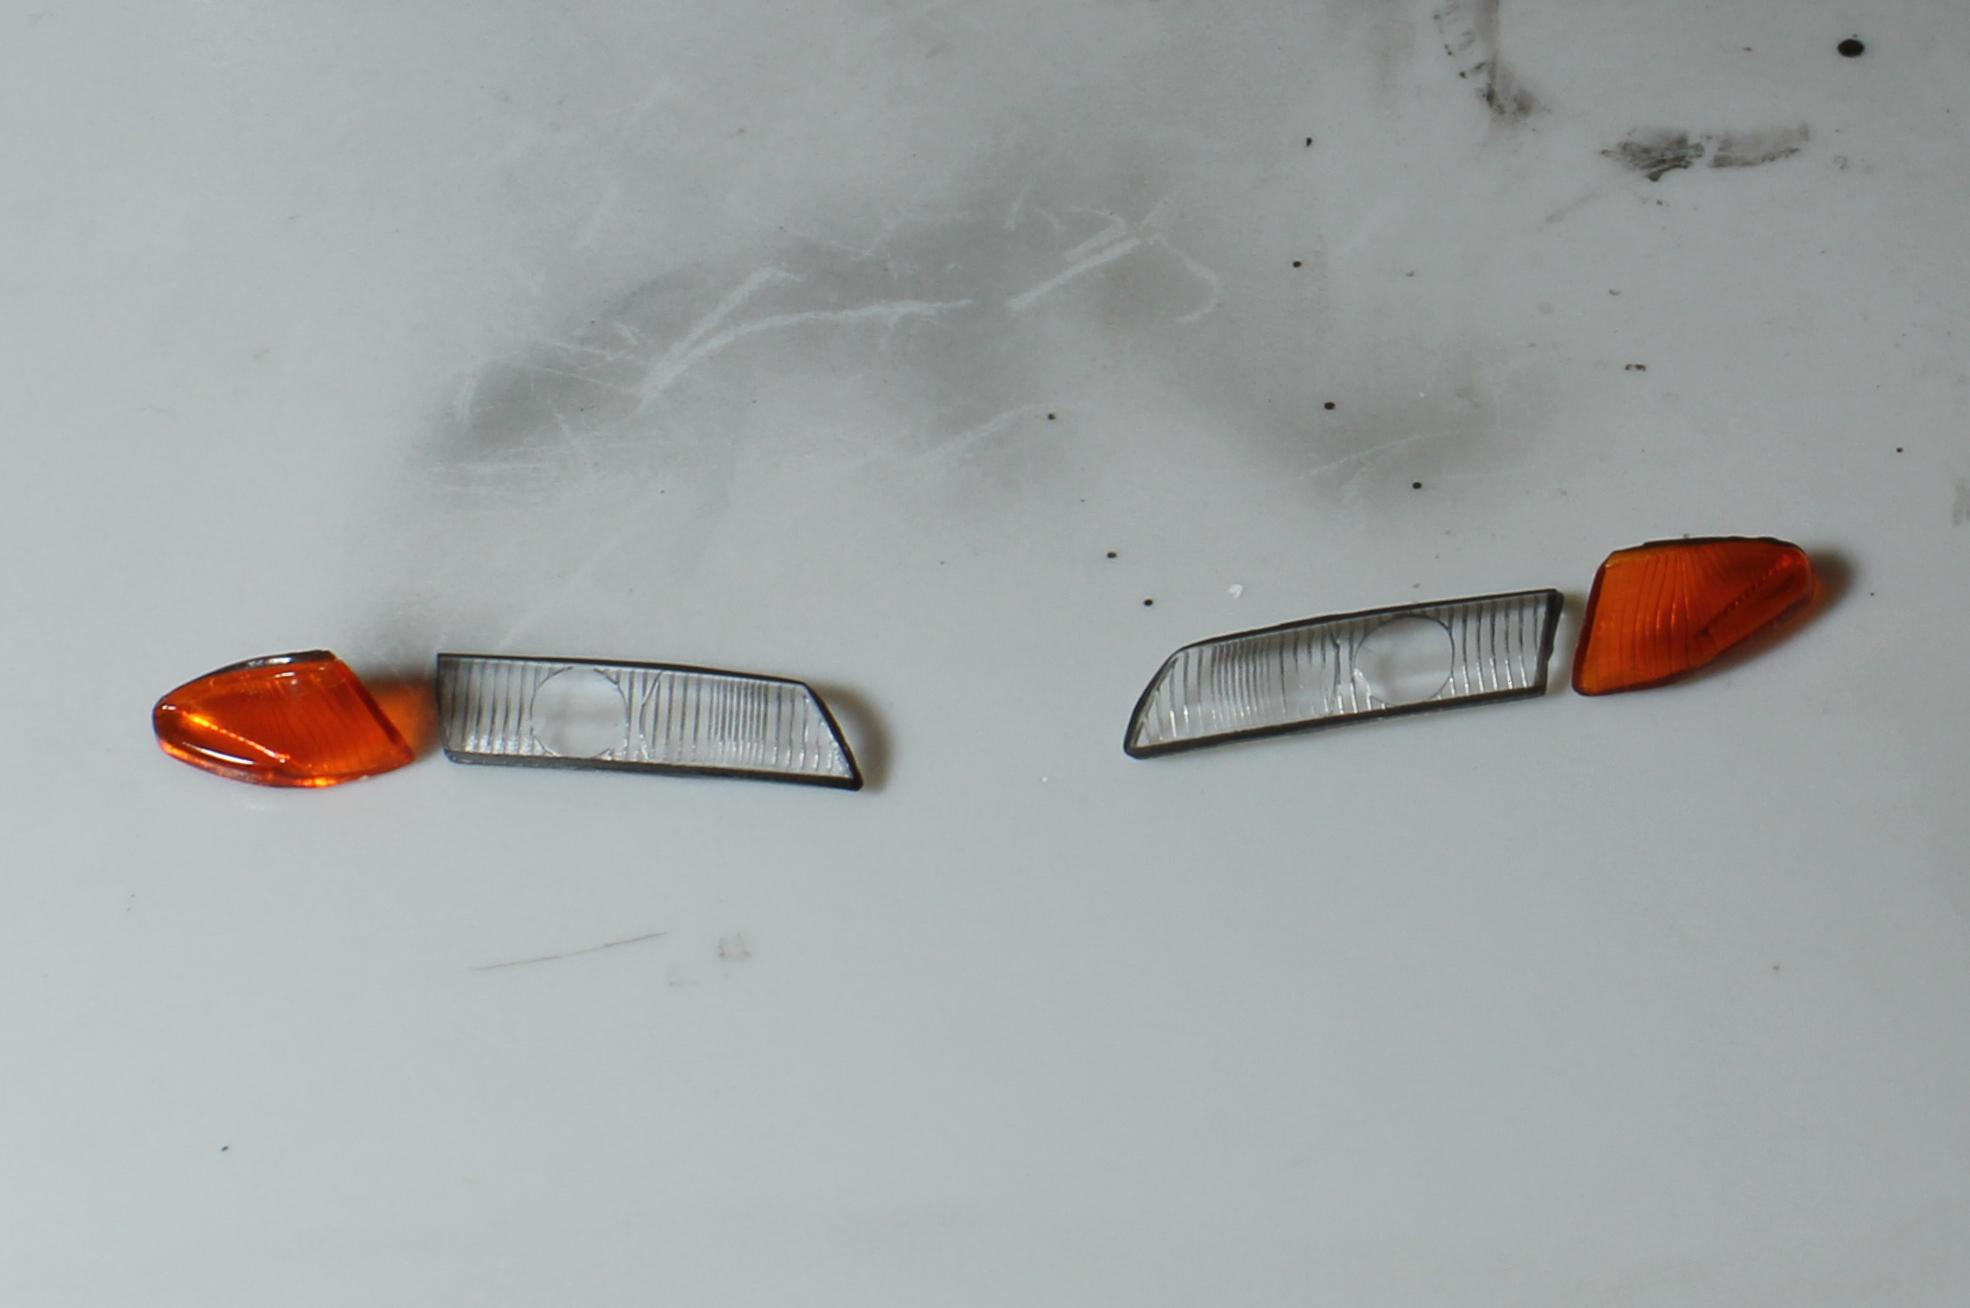 R32ヘッドライトとウインカー塗装後